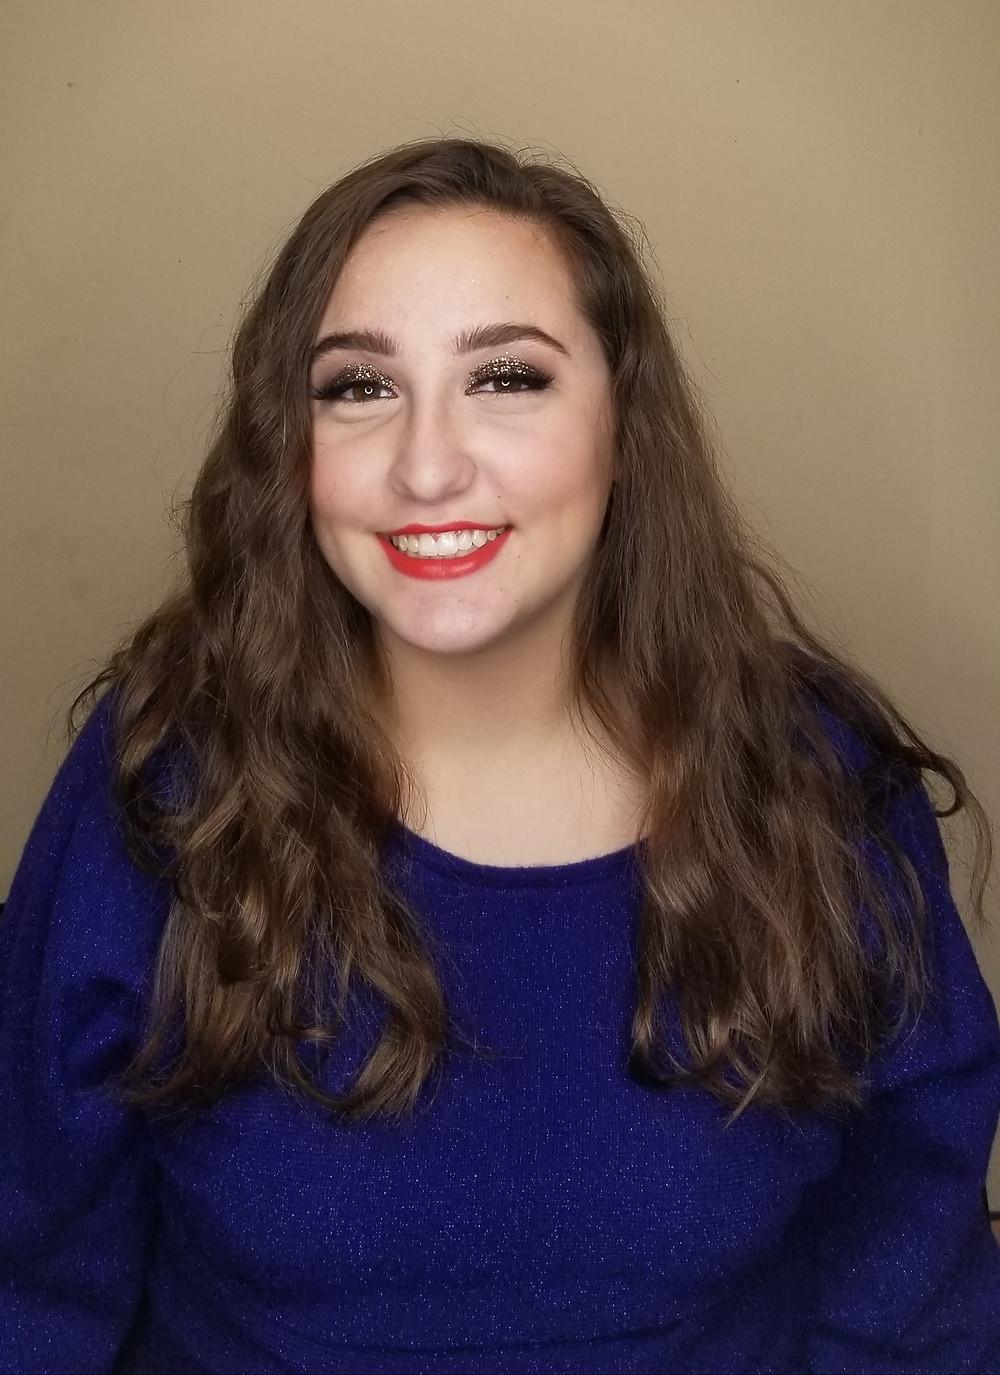 Glamorous makeup look!